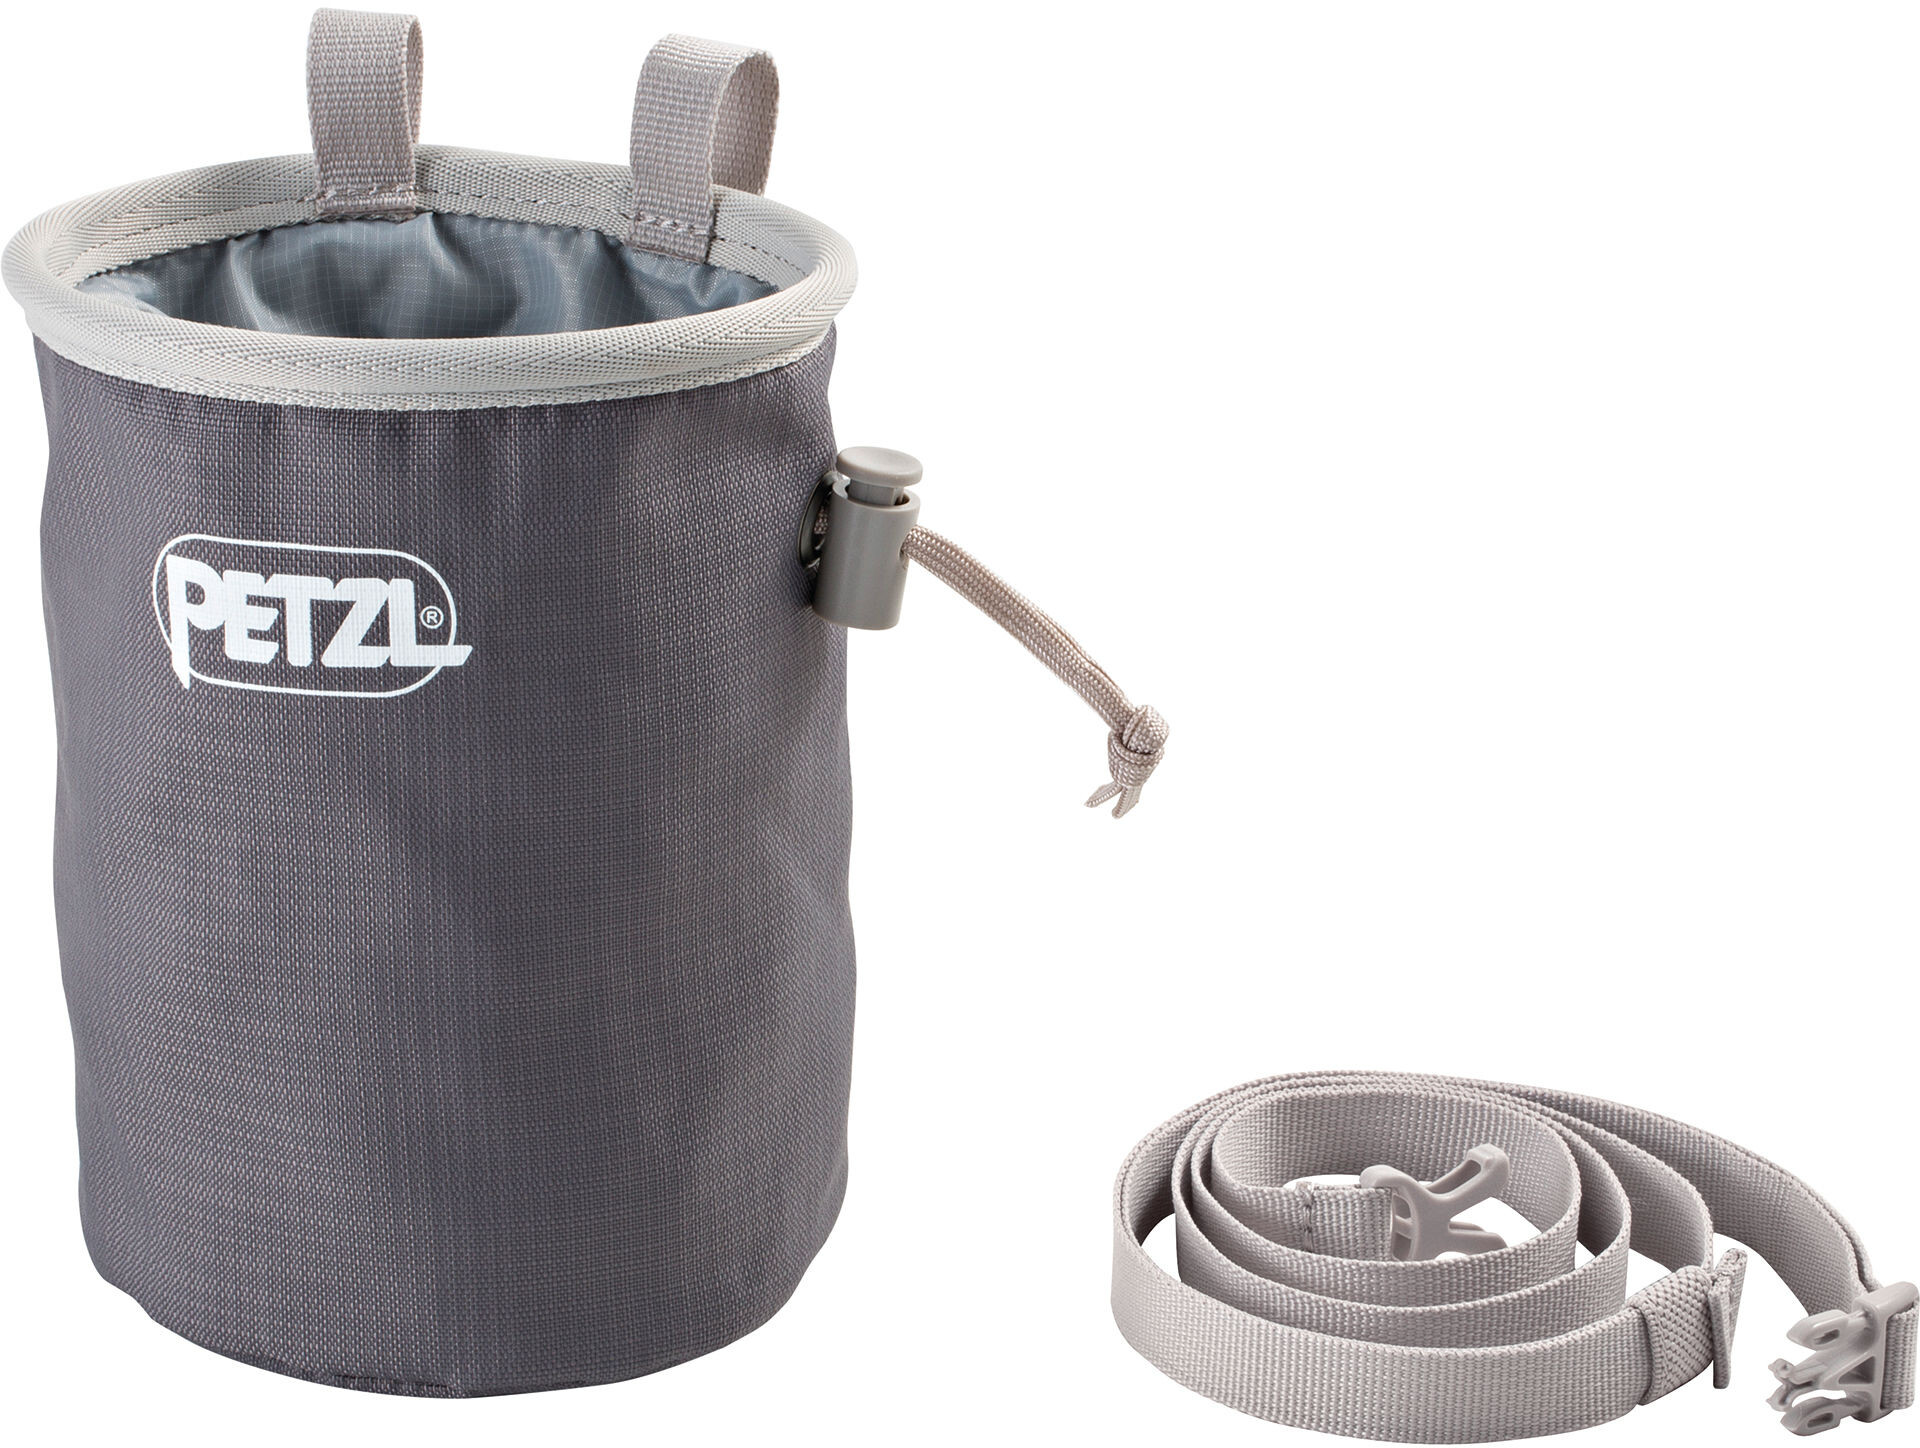 Klettergurt Campz : Petzl kit corax klettergurt grau campz.de